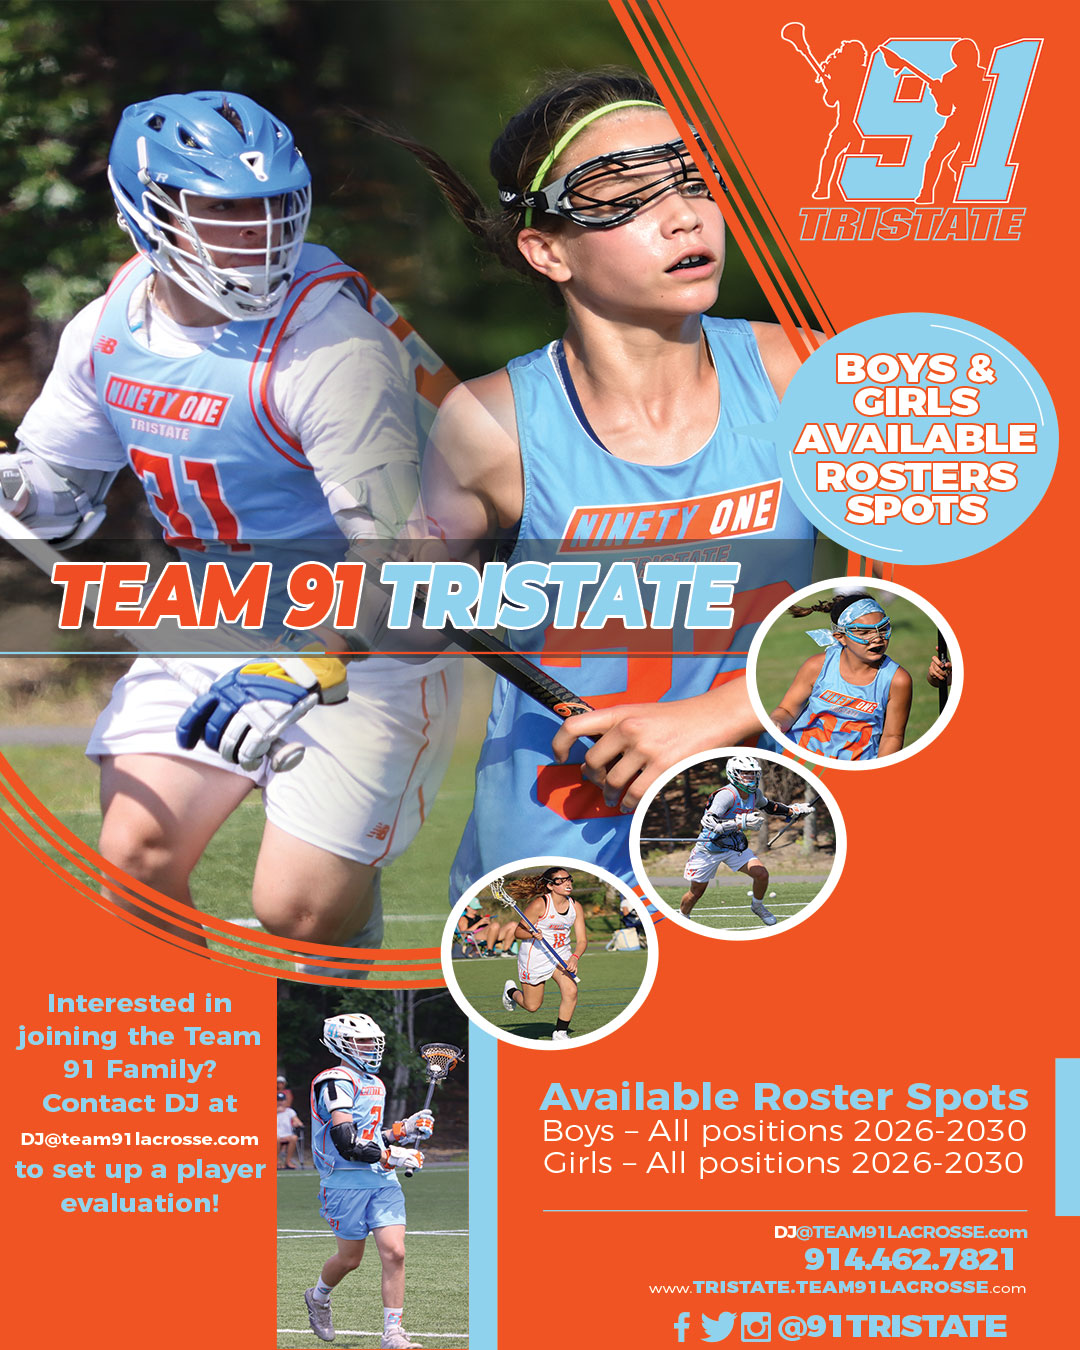 Team91-Tristate-BoysGirls-AvailableRosterSpots